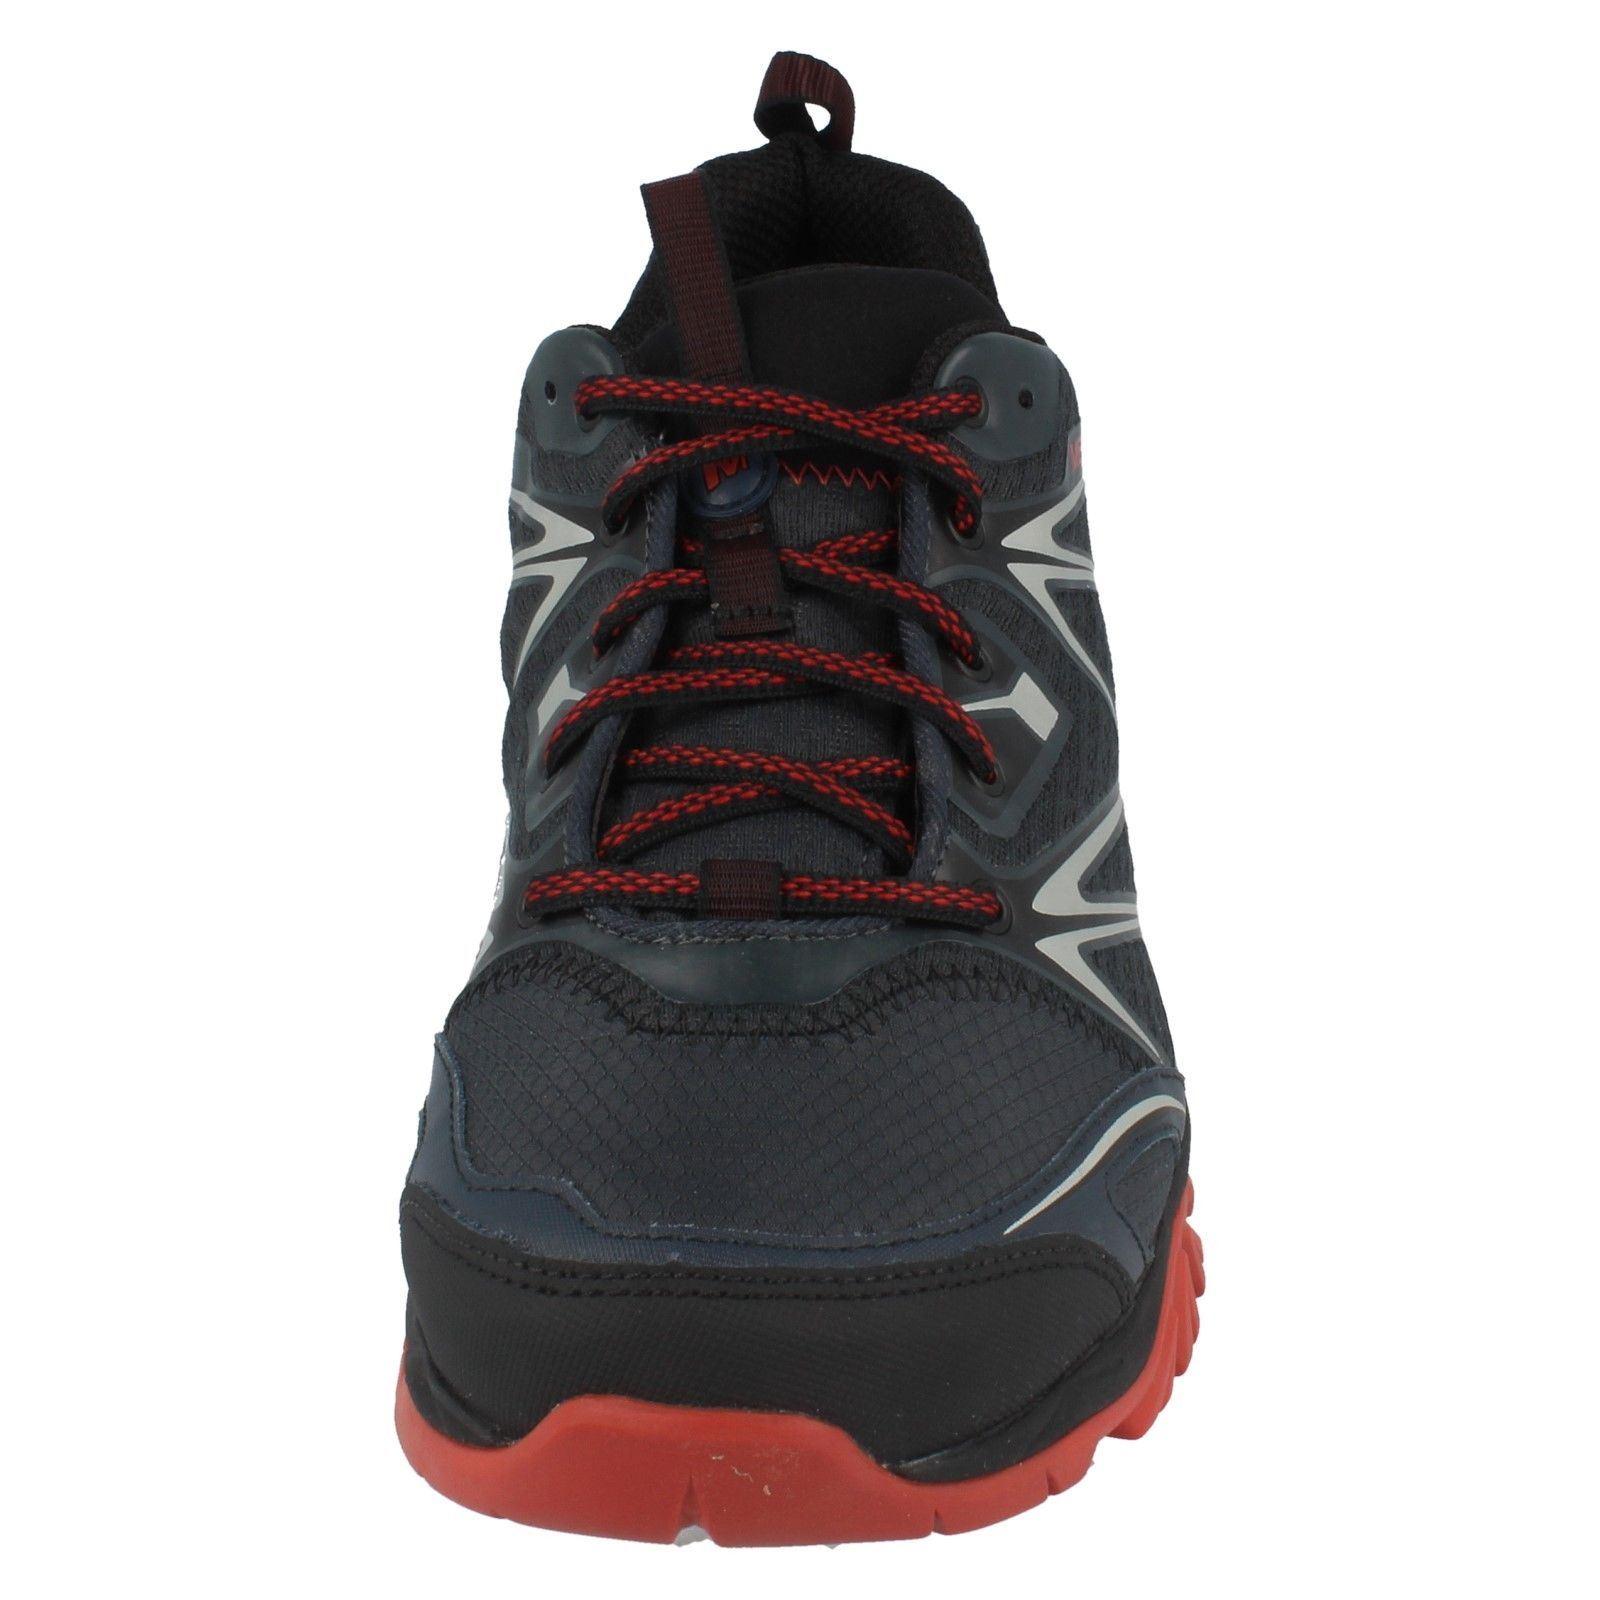 Homme Merrell Merrell Merrell Capra Boulon Gore-Tex Chaussures De Ran ée-Le style J35727 901af7